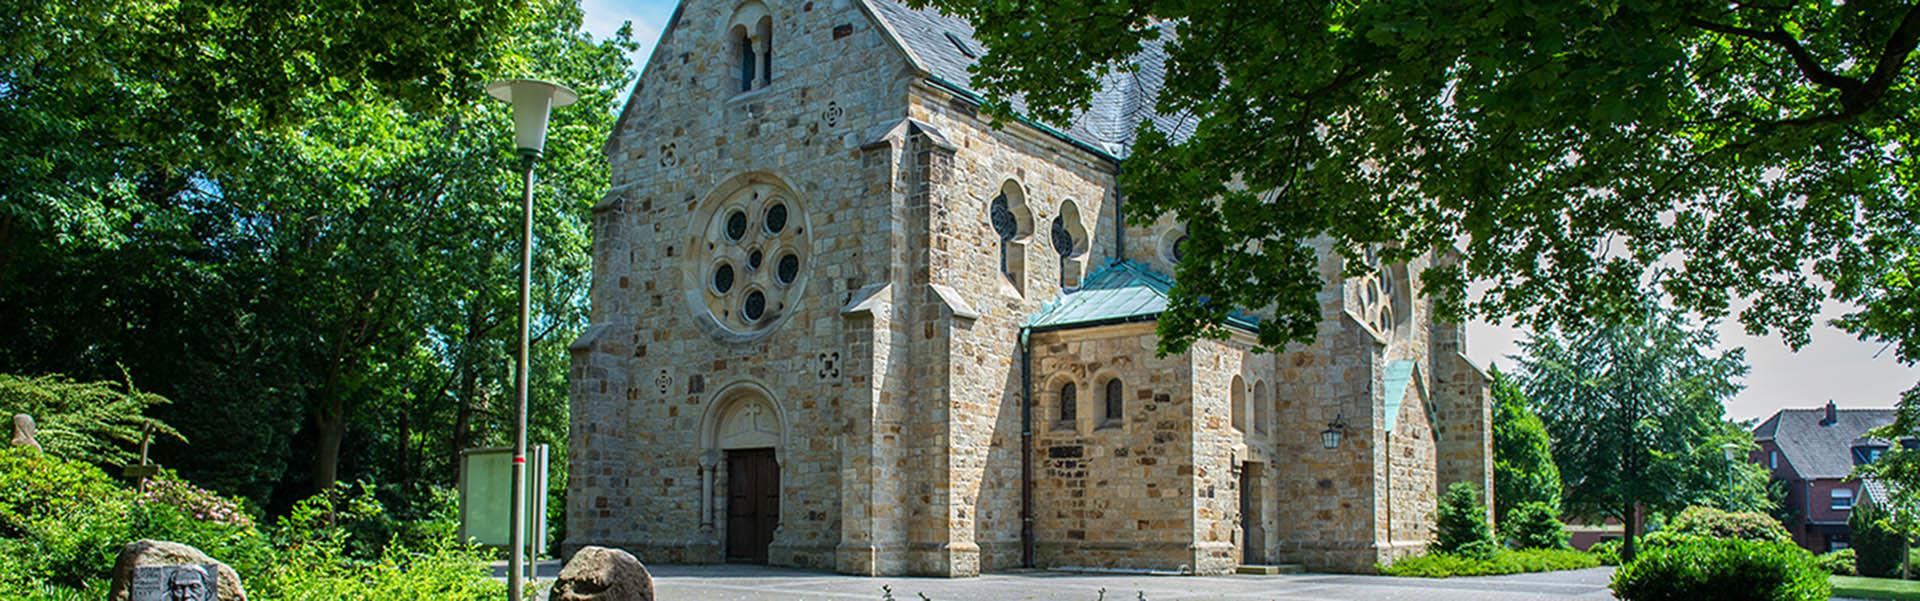 St. Mariä Heimsuchung in Hauenhorst